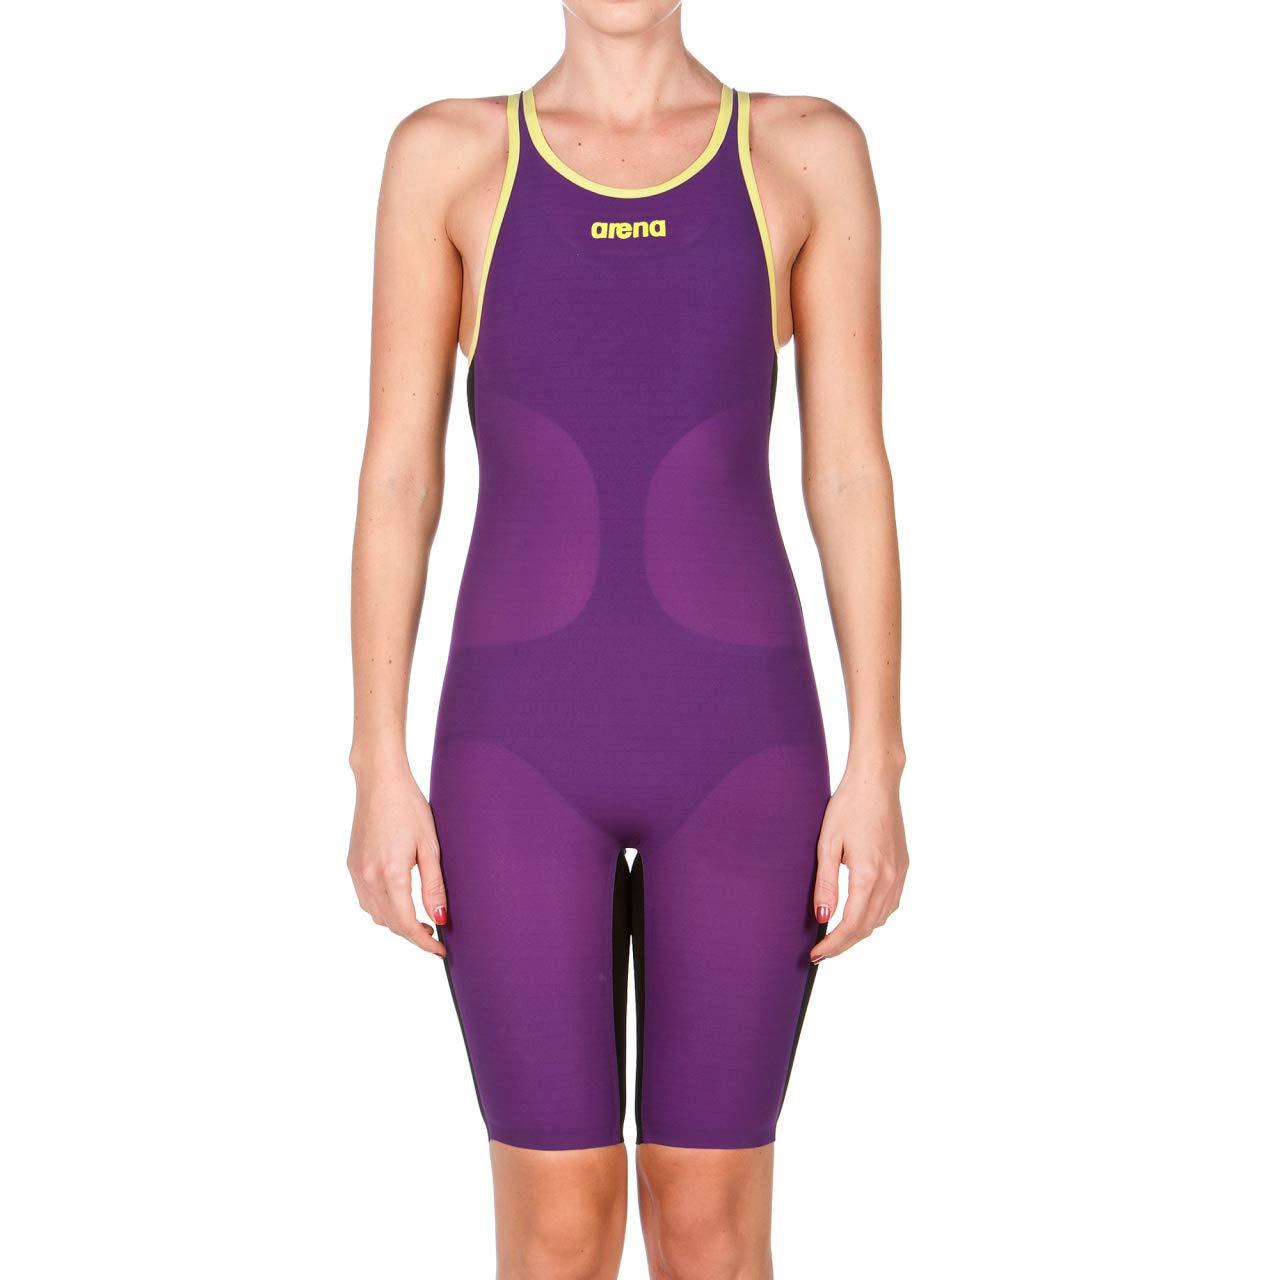 arena Powerskin Carbon Air FBSL Open Back Women's Racing Suit, Plum / Fluo Yellow, 22